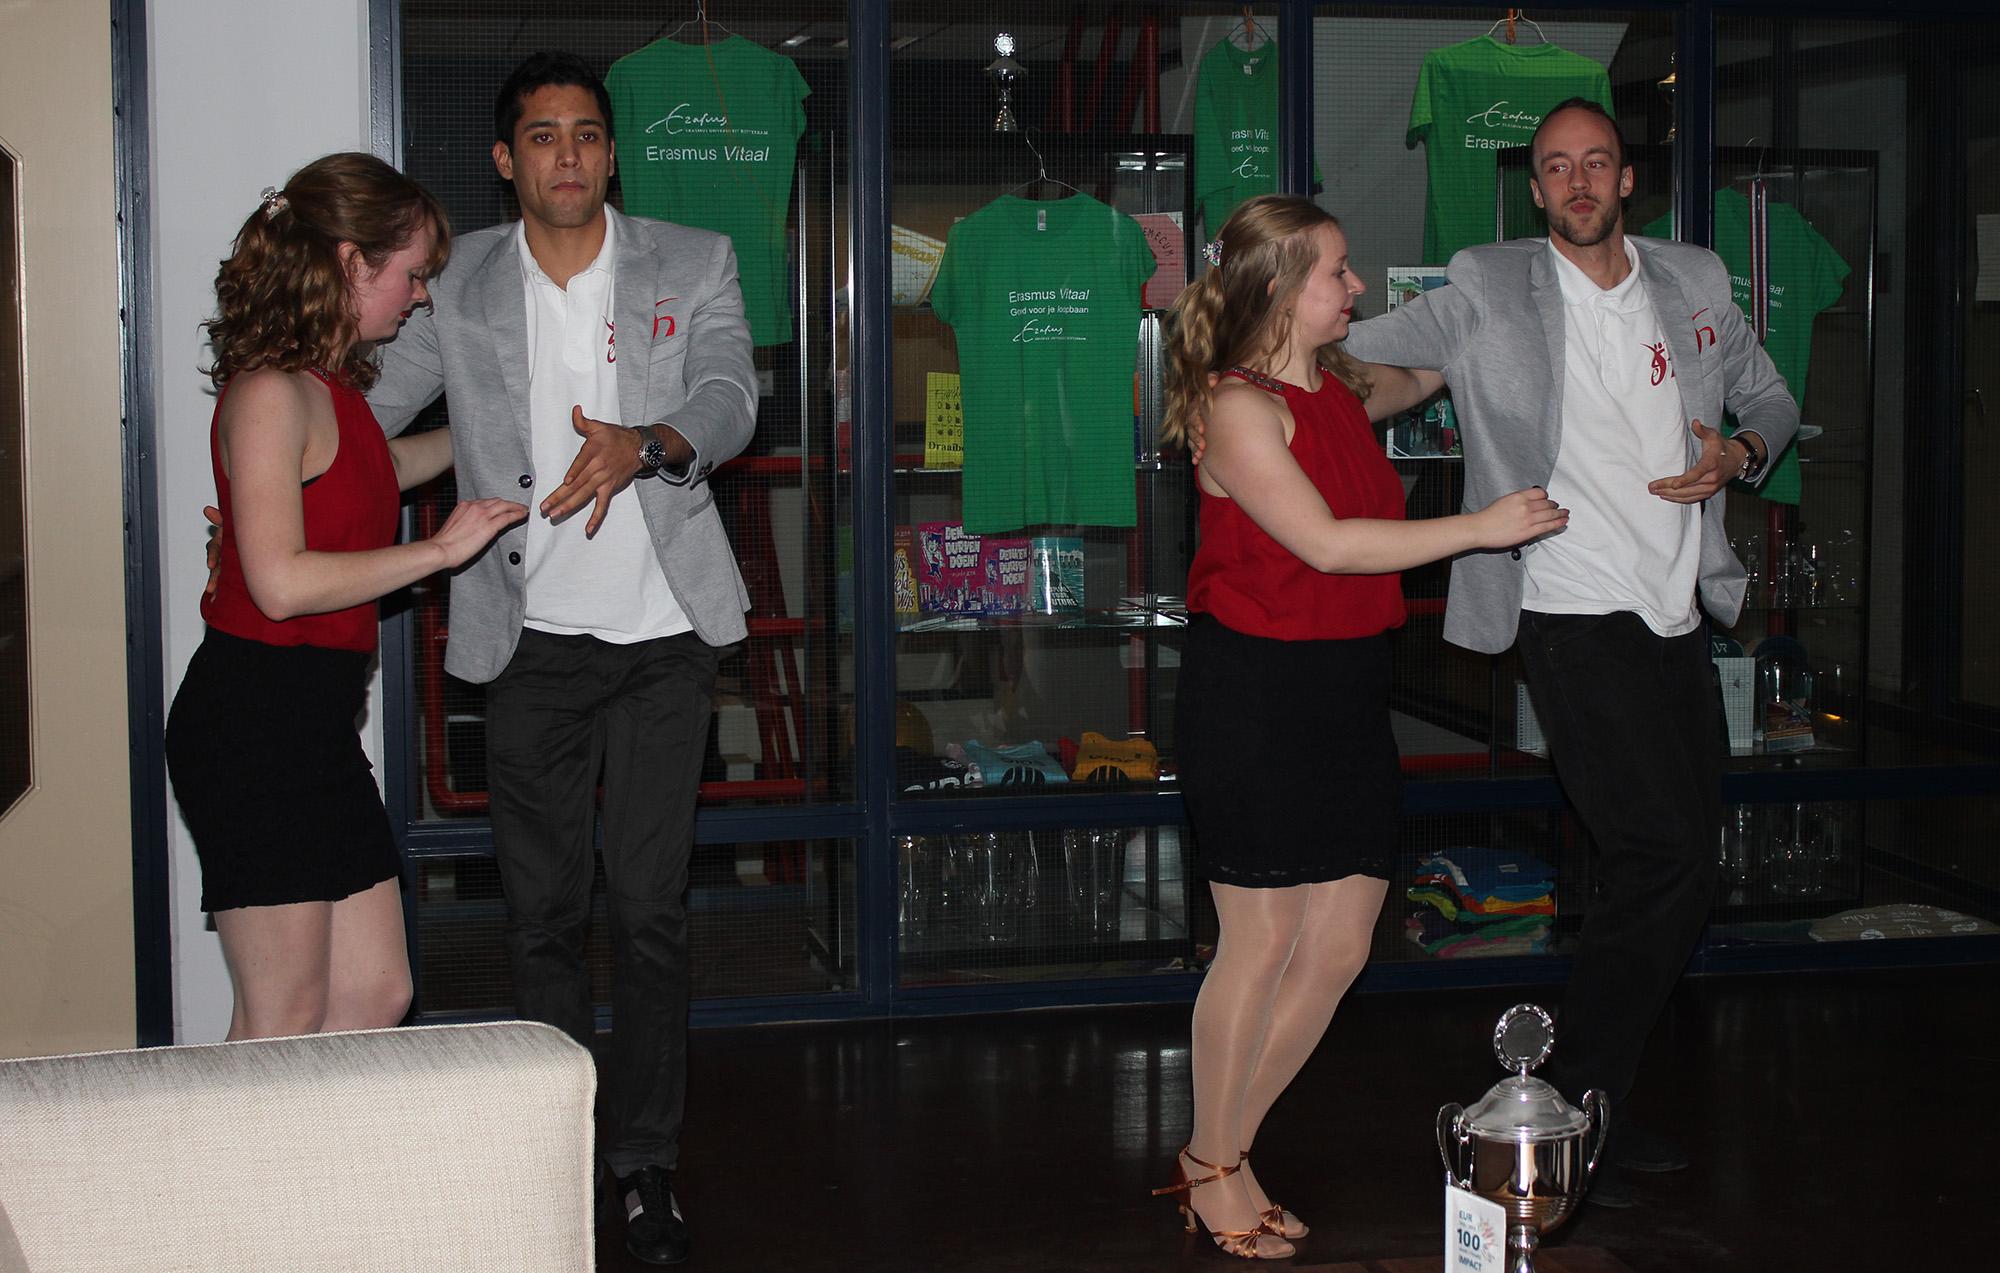 Erasmus Dance Society Roomservice festival